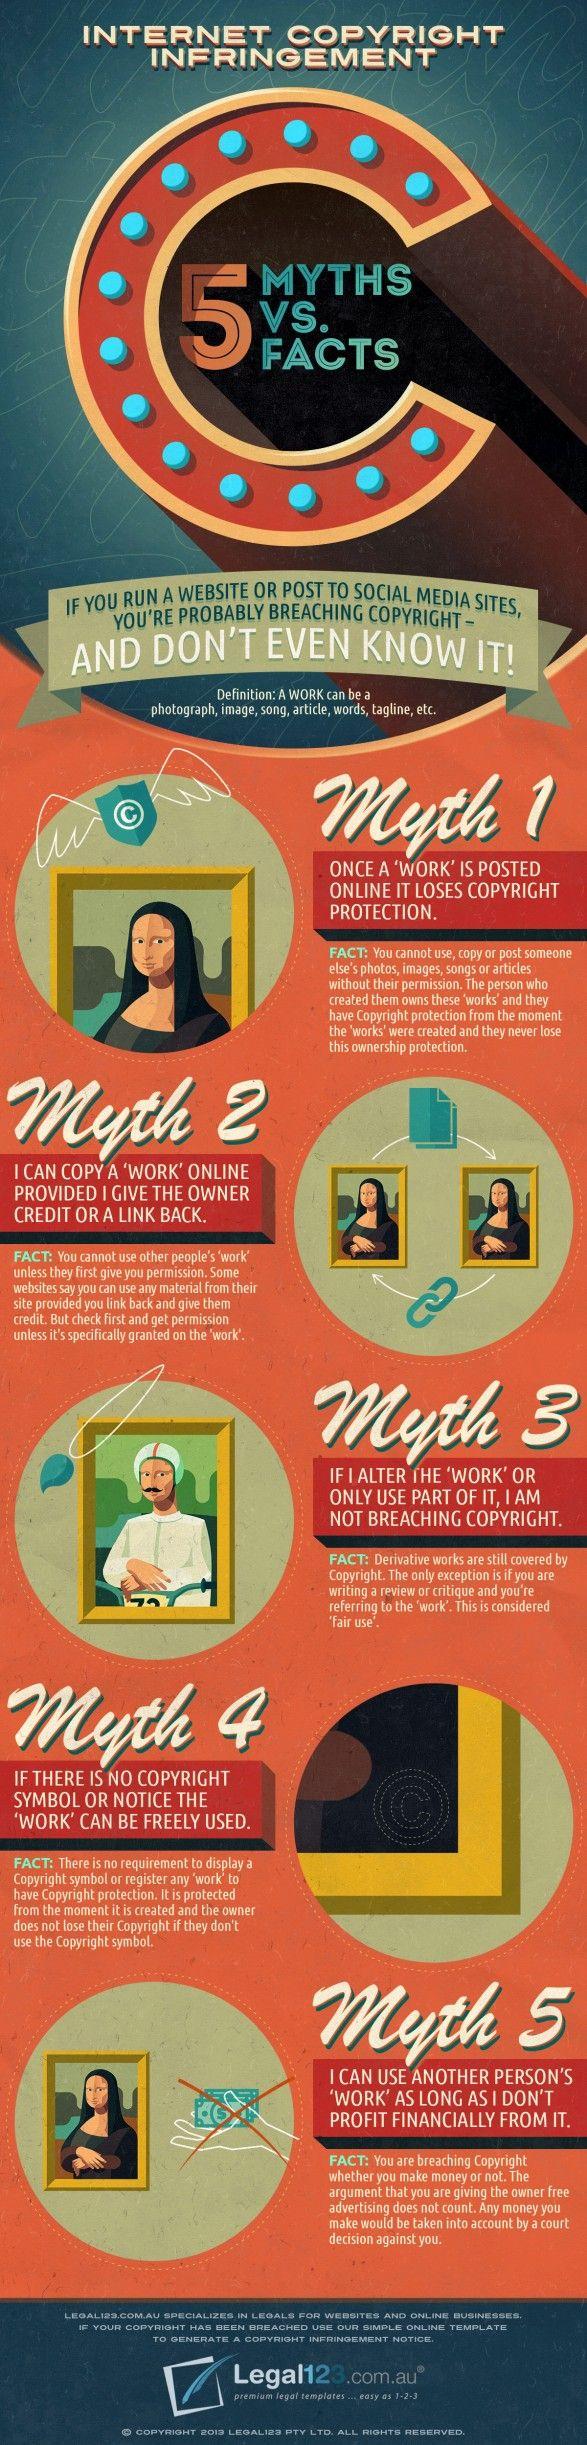 Copyright Infringement: 5 Myths vs Facts - Lightscap3s.com